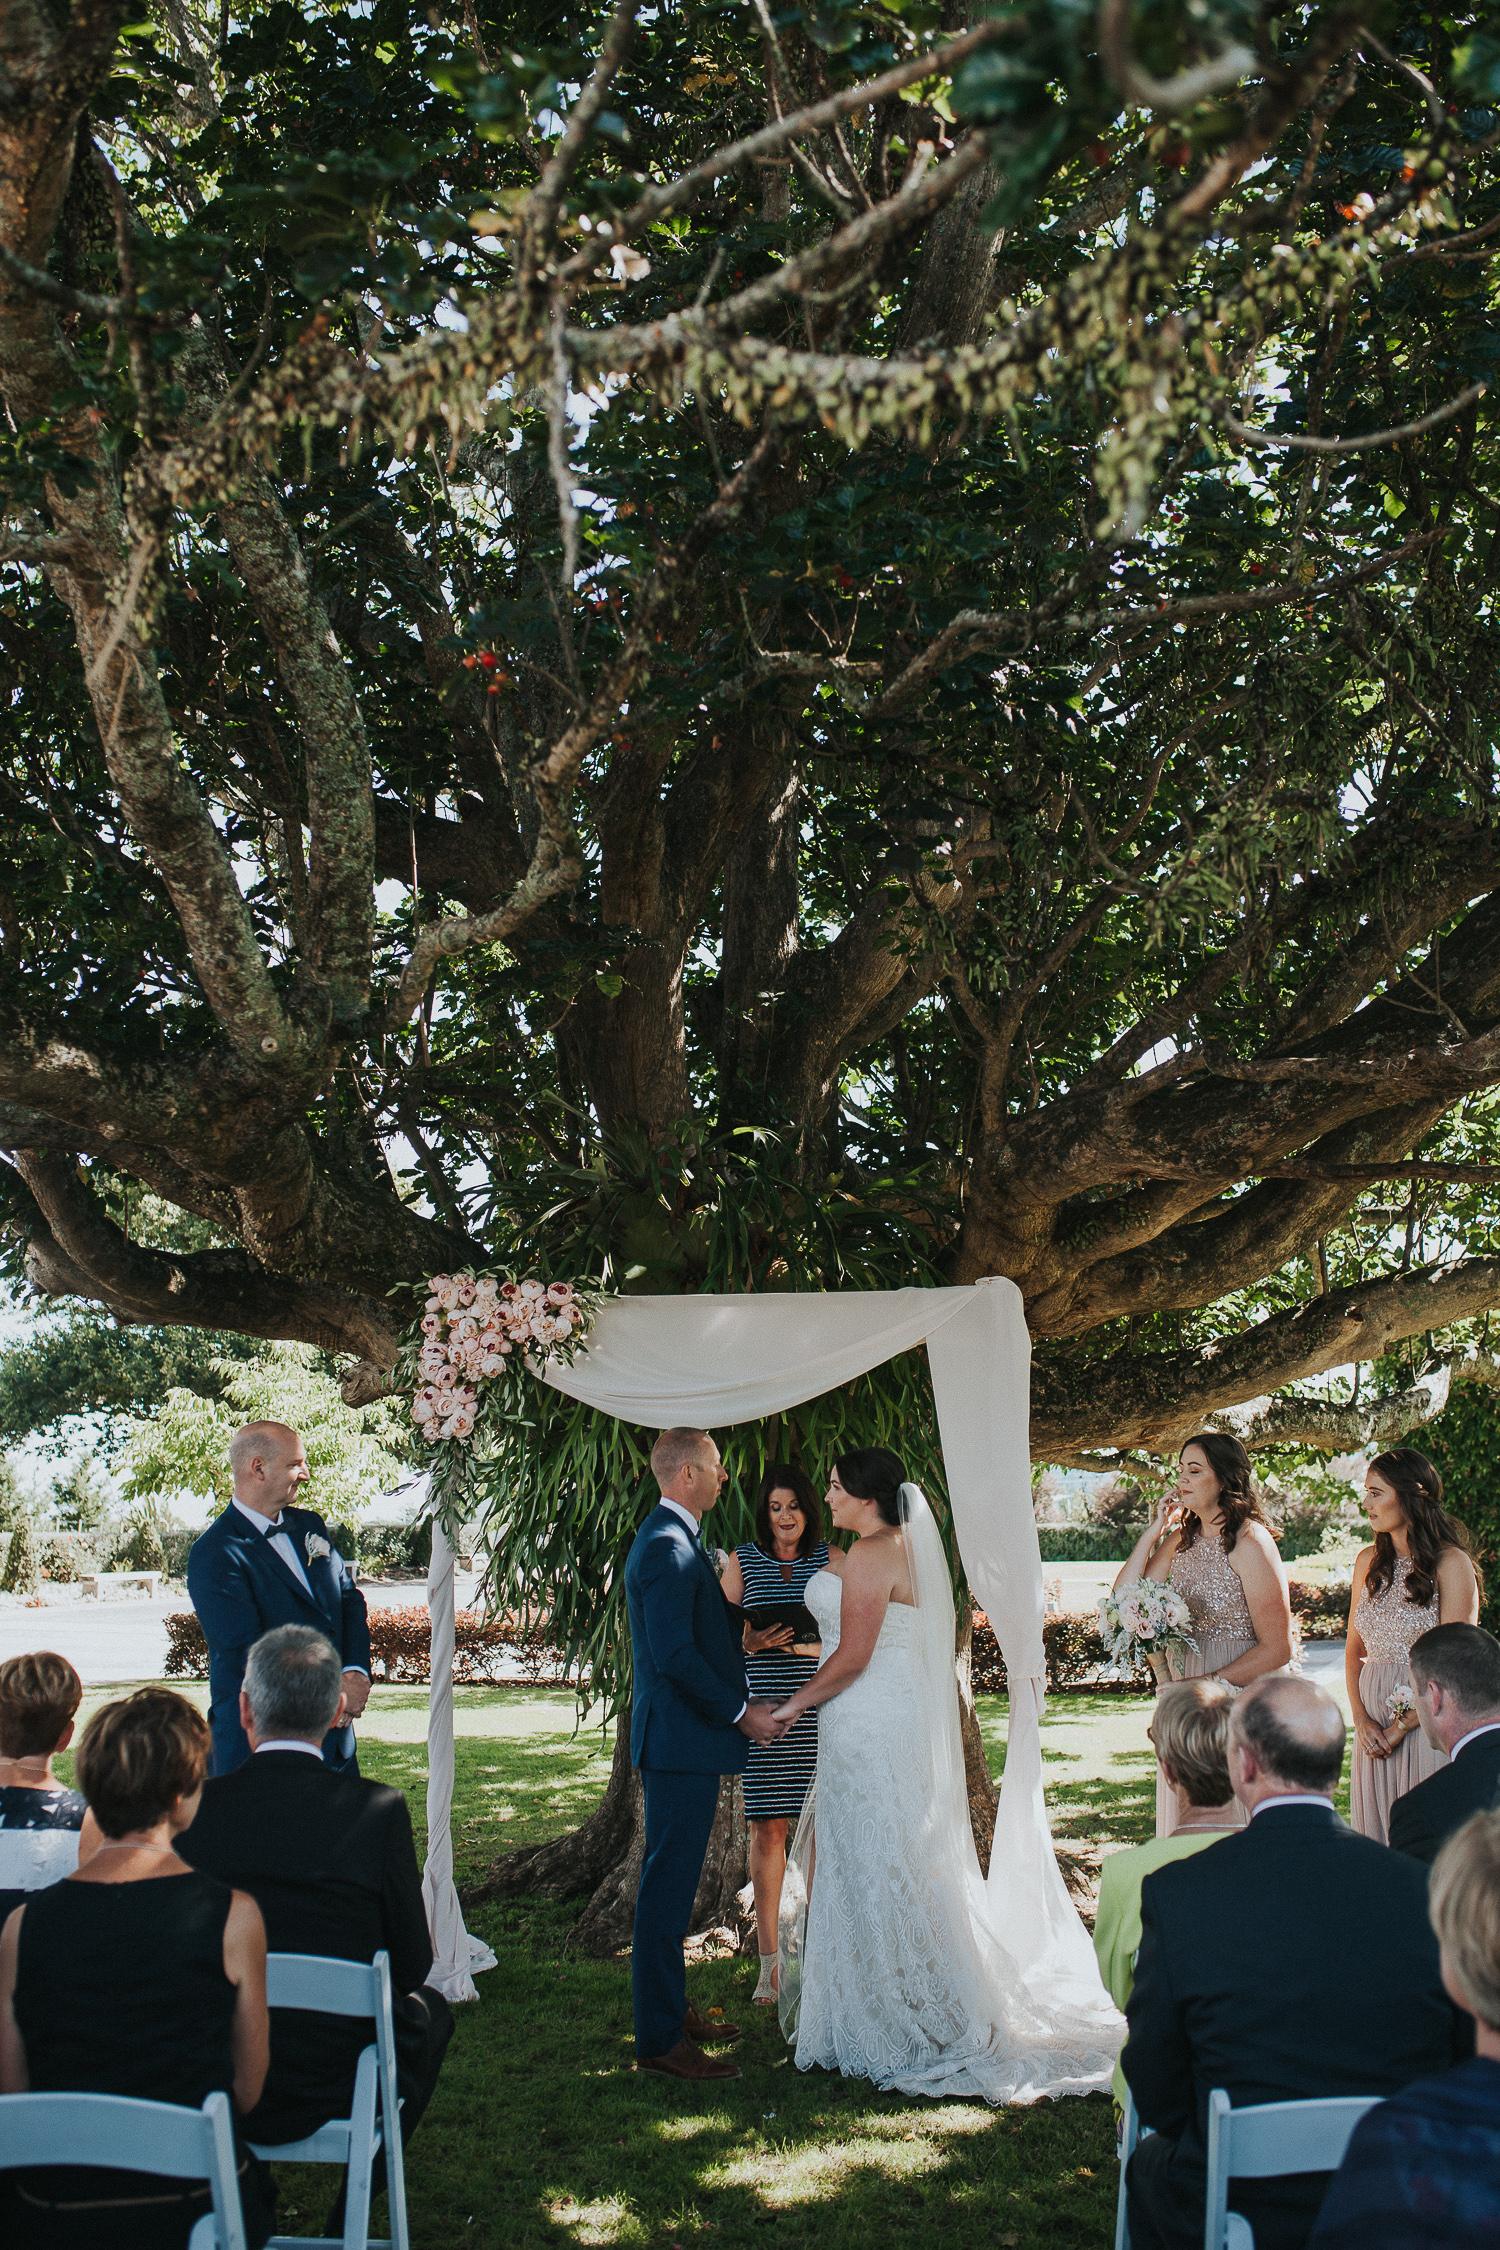 nicola gareth abbeville wedding photographer-105.jpg